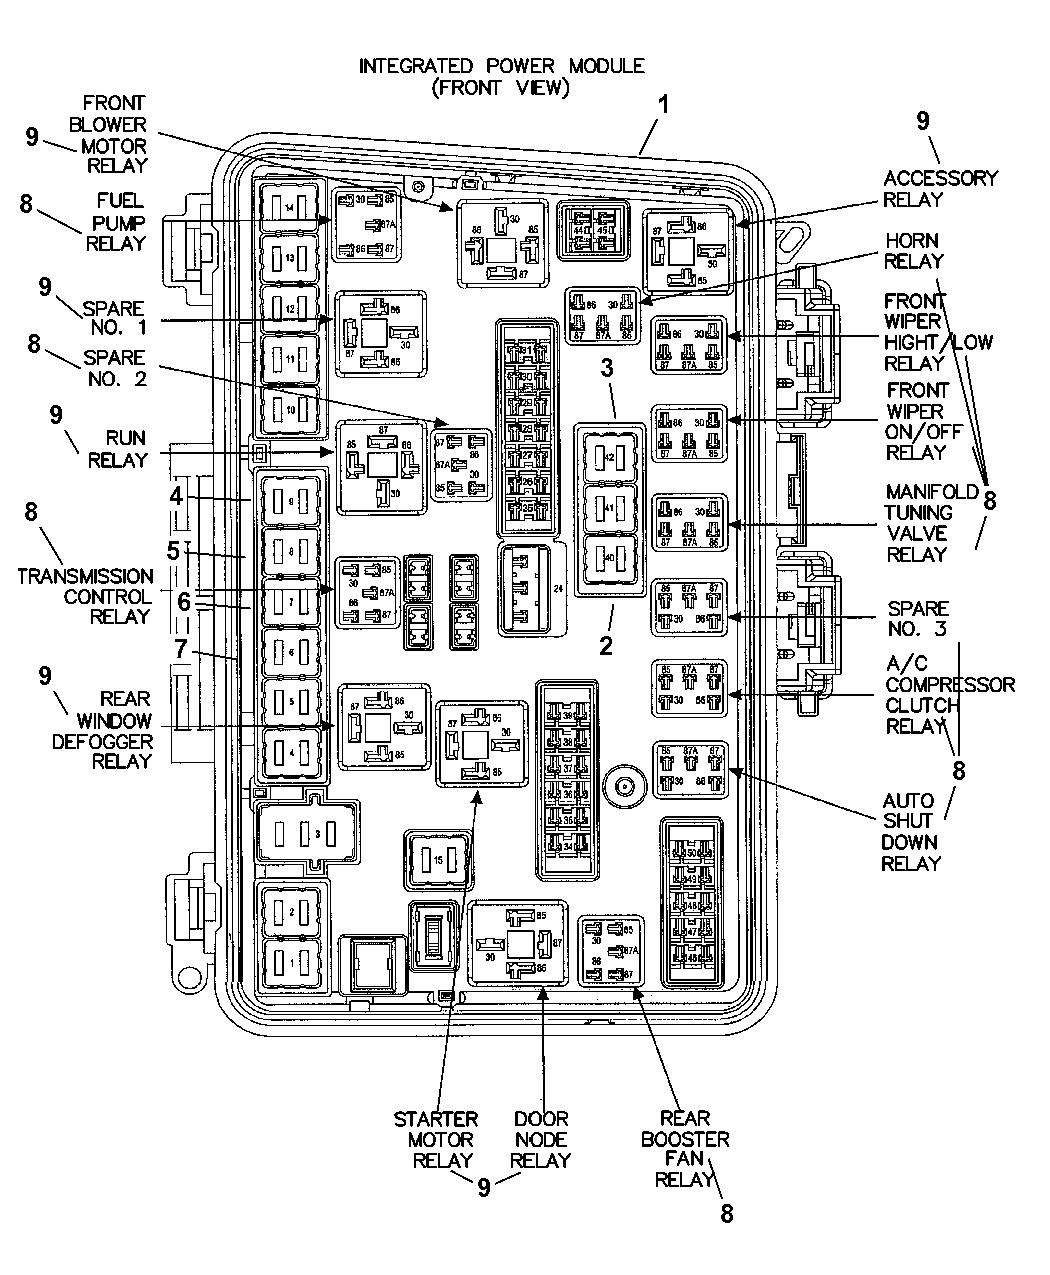 2004 chrysler pacifica power distribution center relay \u0026 fuses2004 Chrysler Pacifica Engine Diagram #13